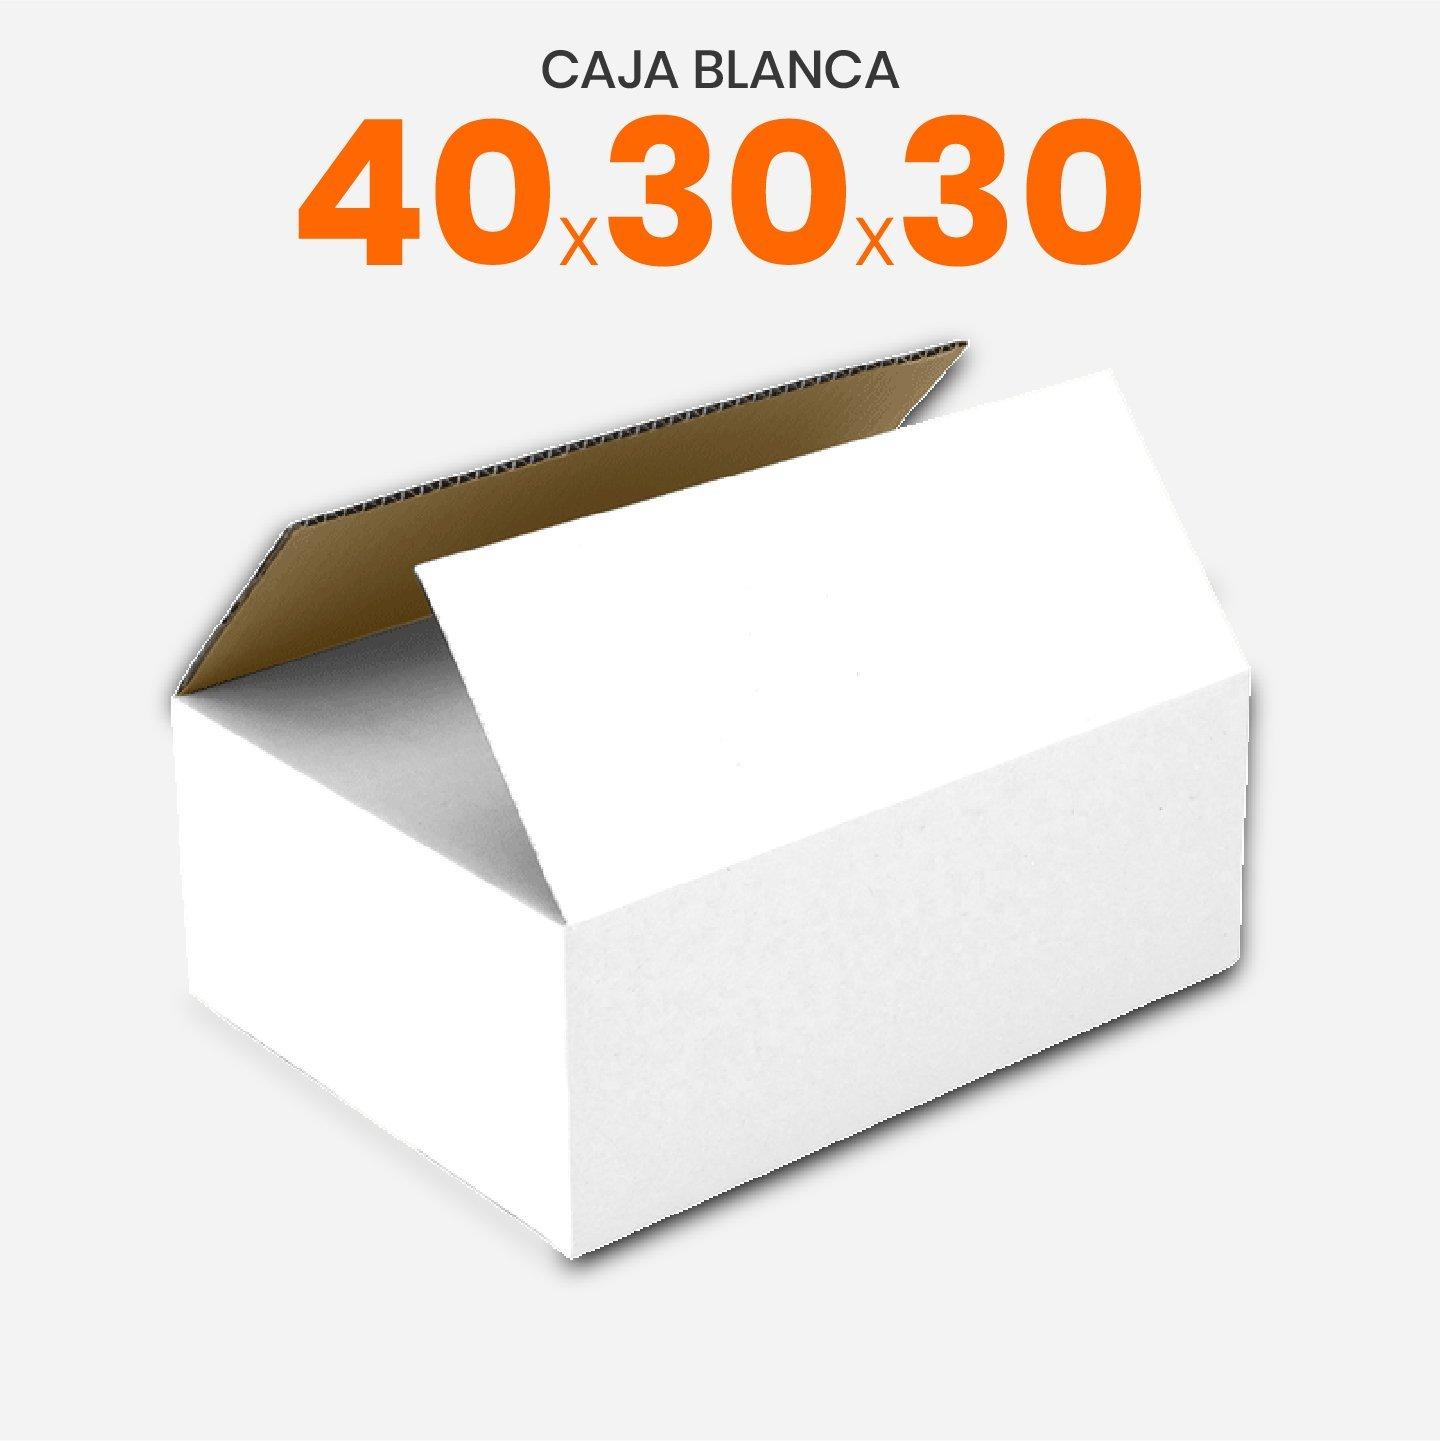 Caja De Cartón Corrugado Blanca 40x30x30